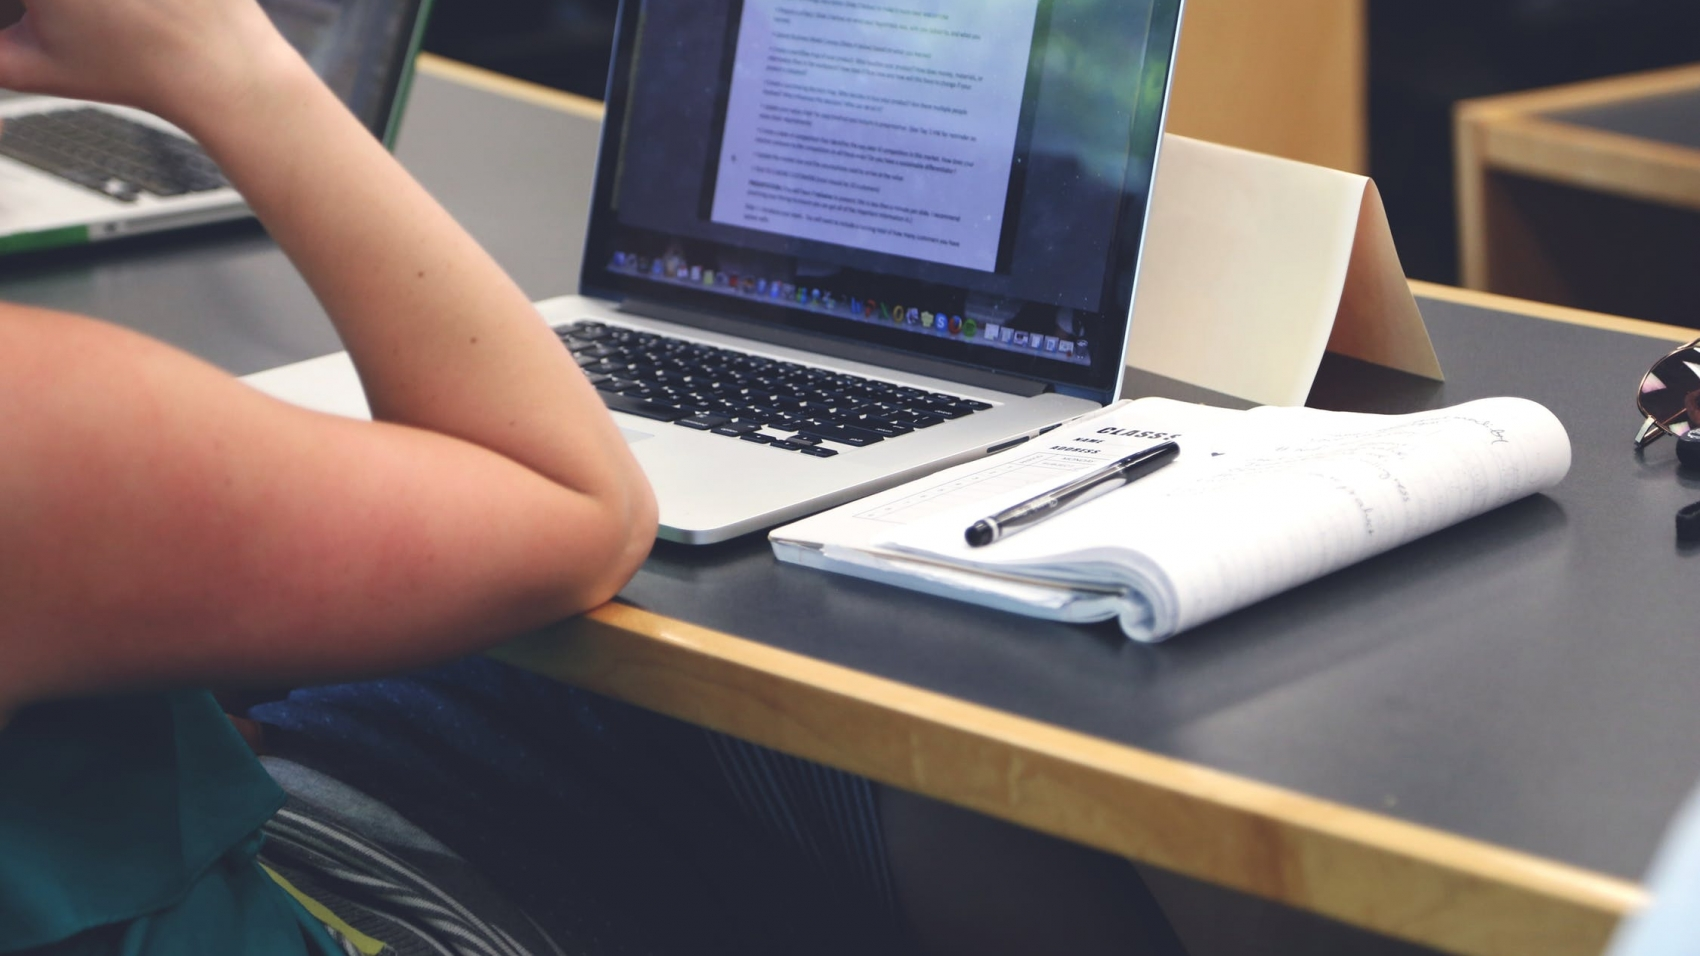 studentlaptop